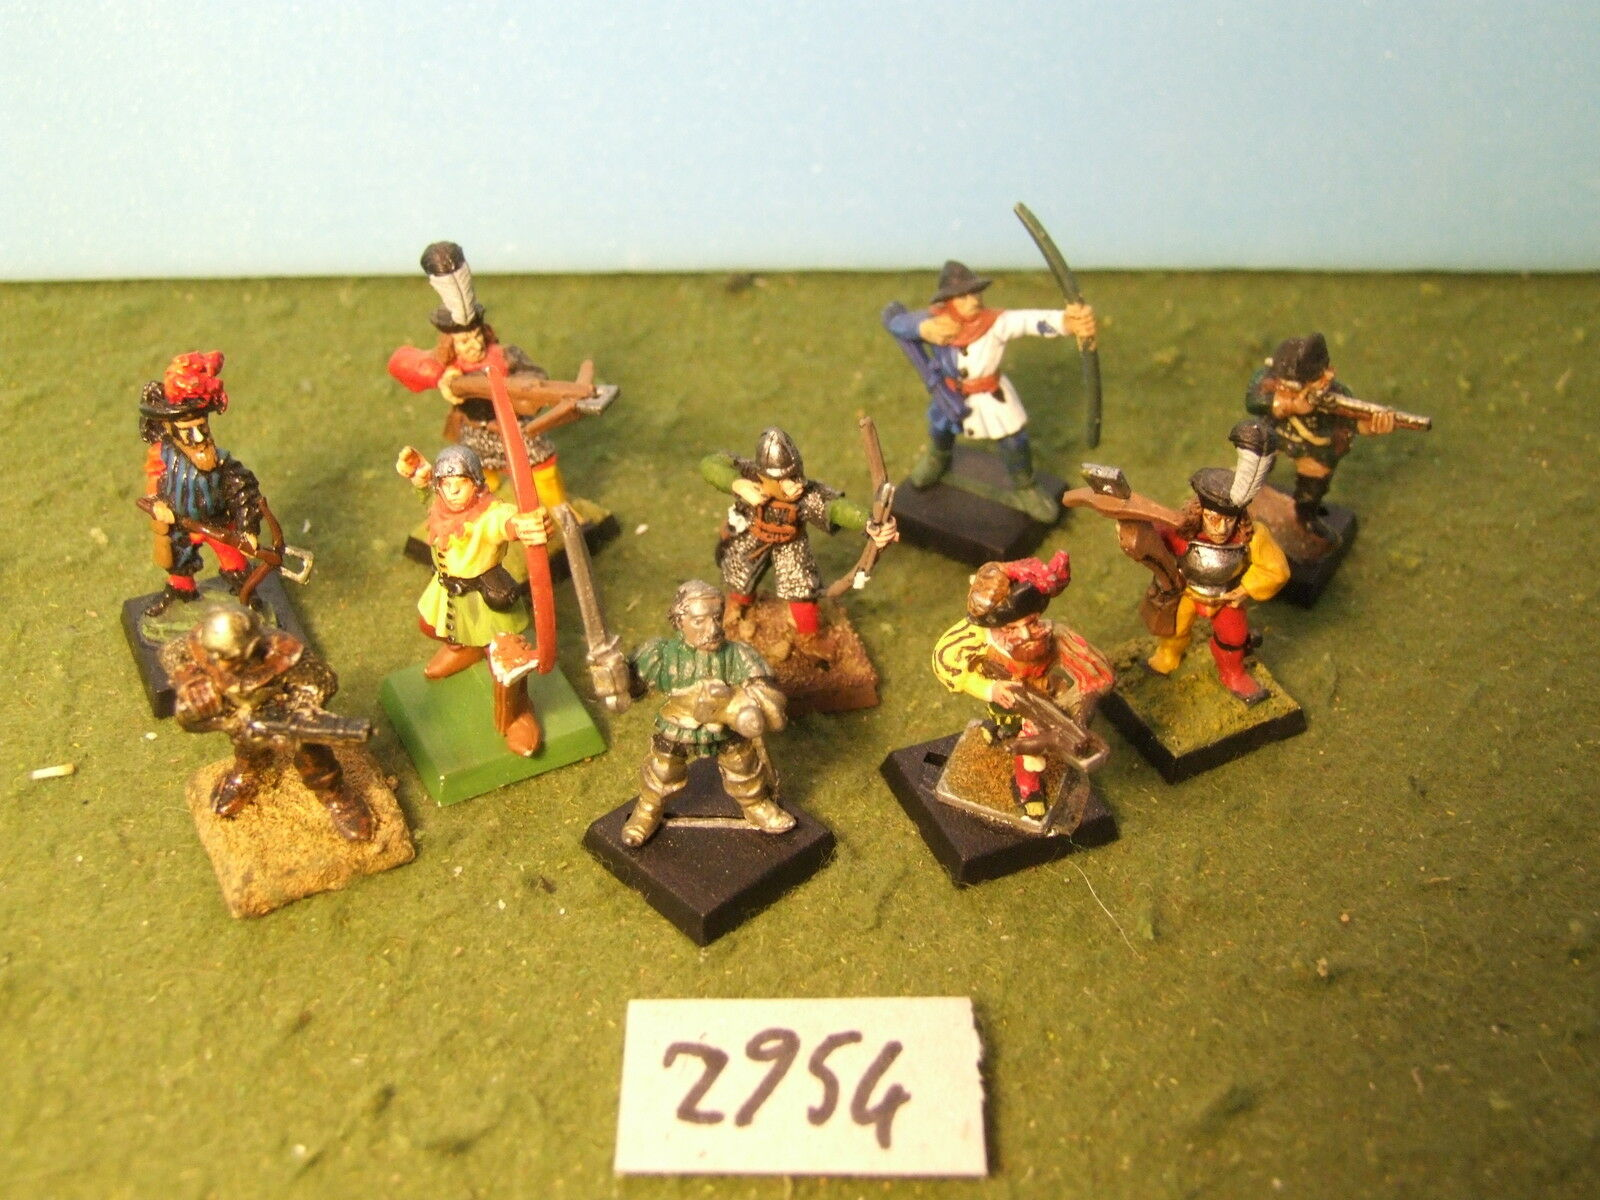 Mordheim warband 10 archers metal painted (2954) fantasy warhammer